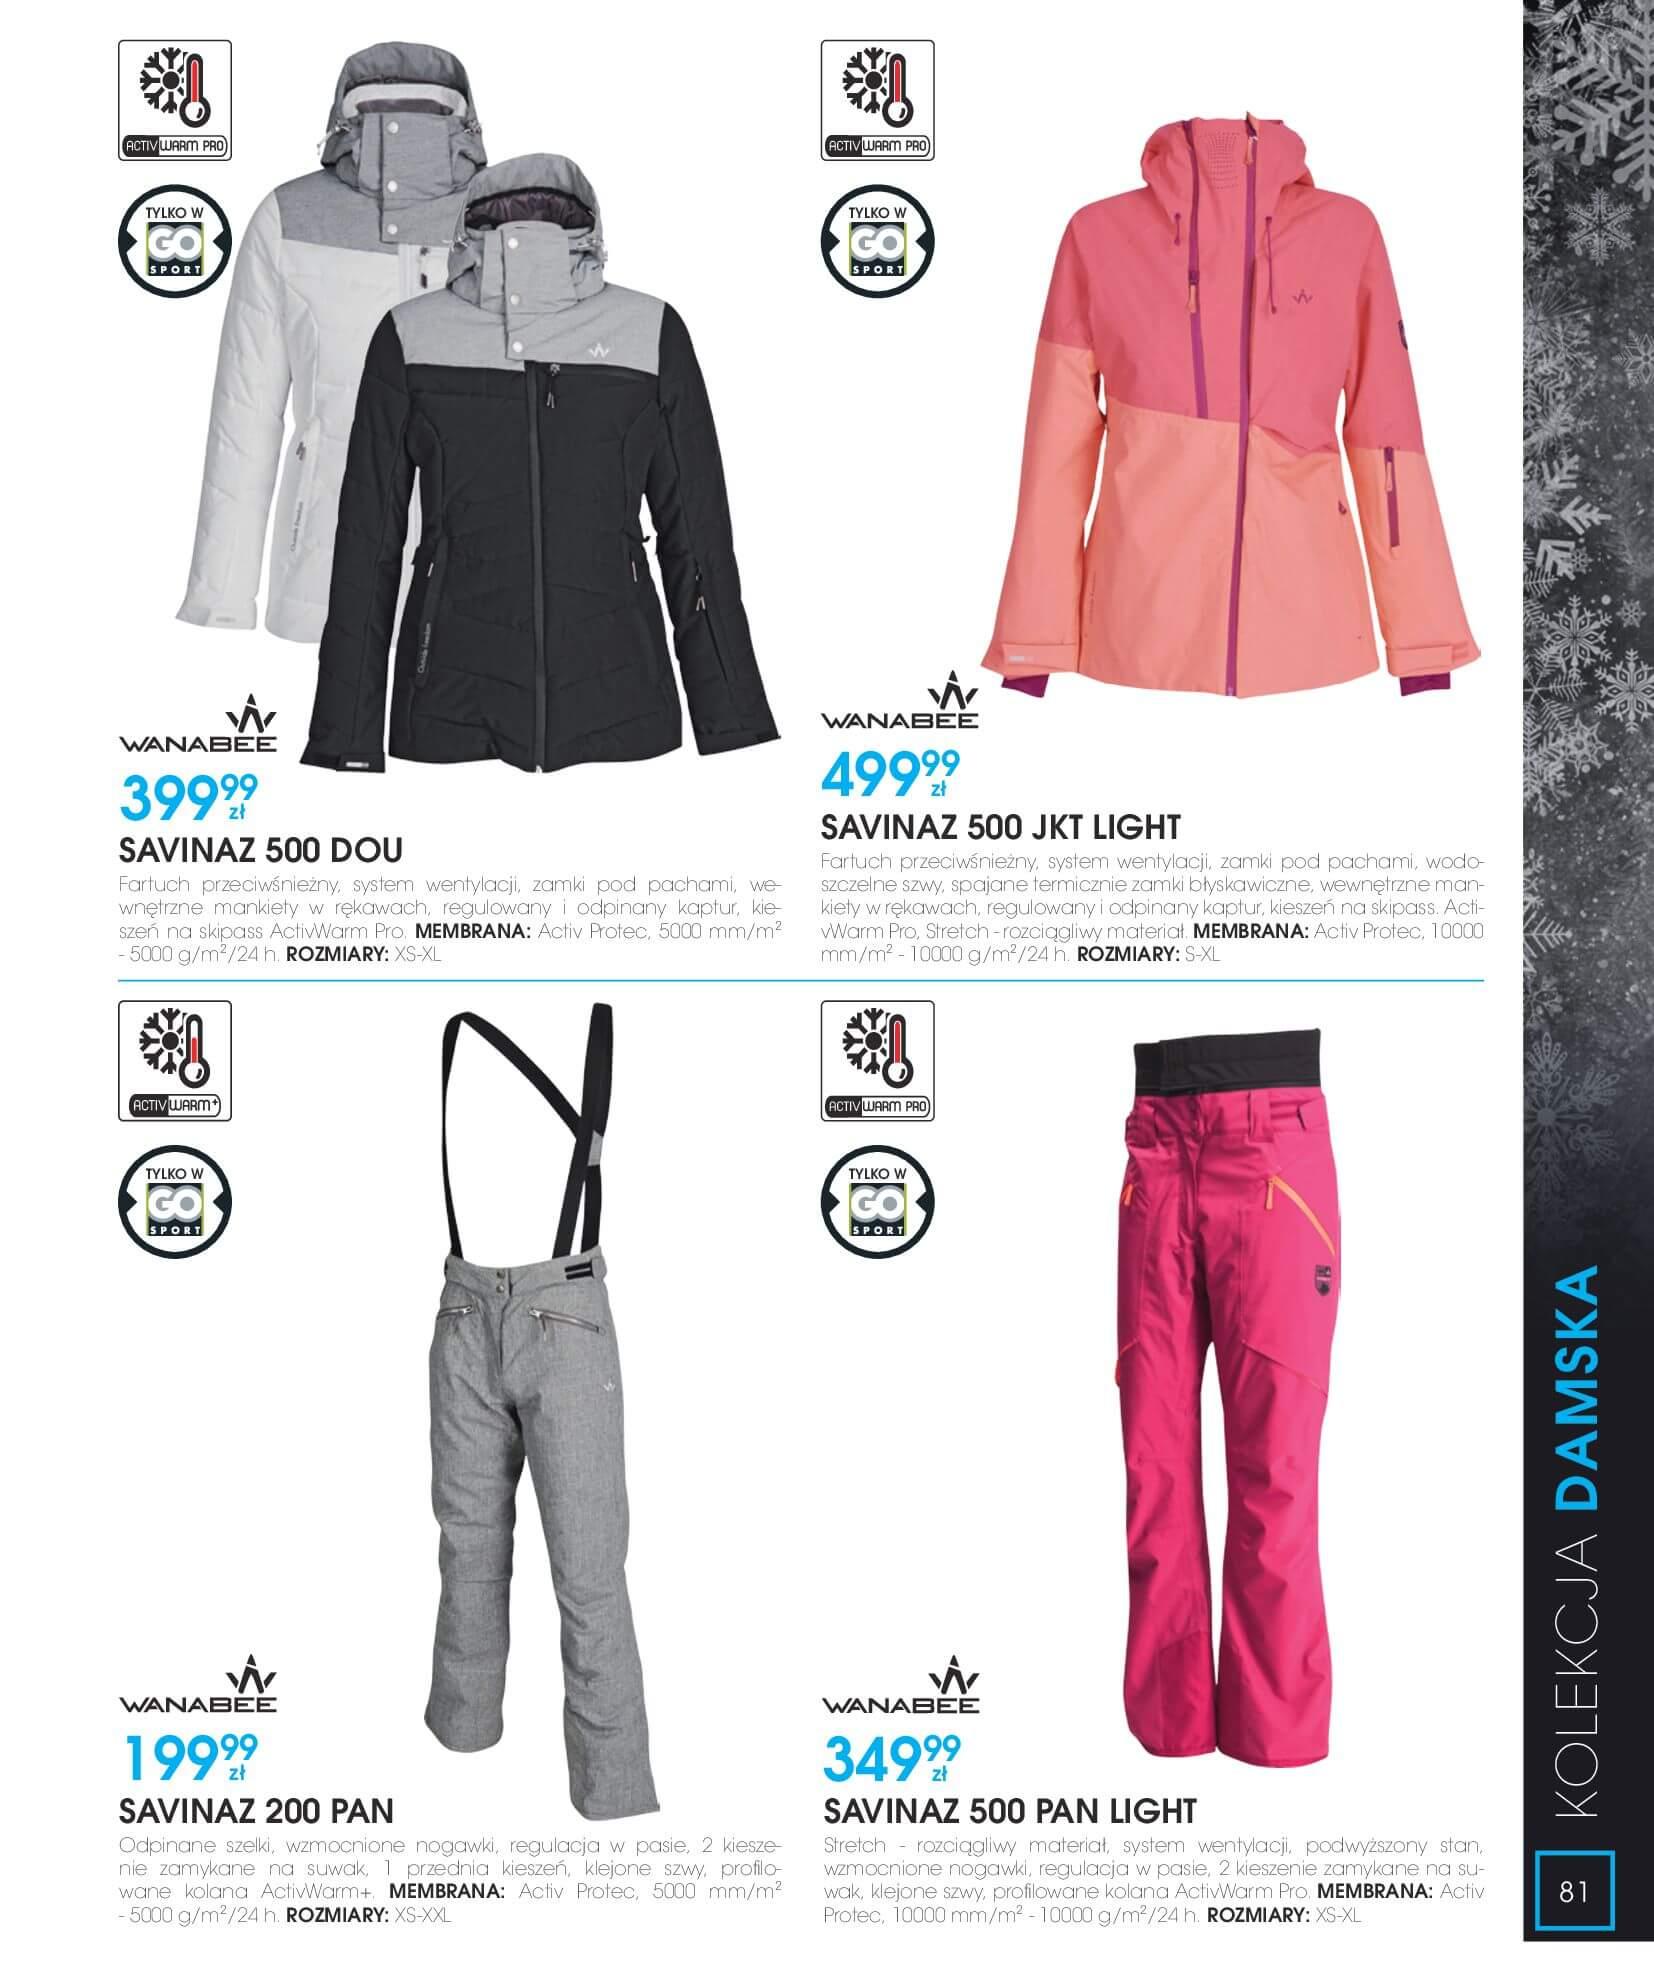 Gazetka Go Sport - Katalog Zima 2017/2018-12.11.2017-28.02.2018-page-81